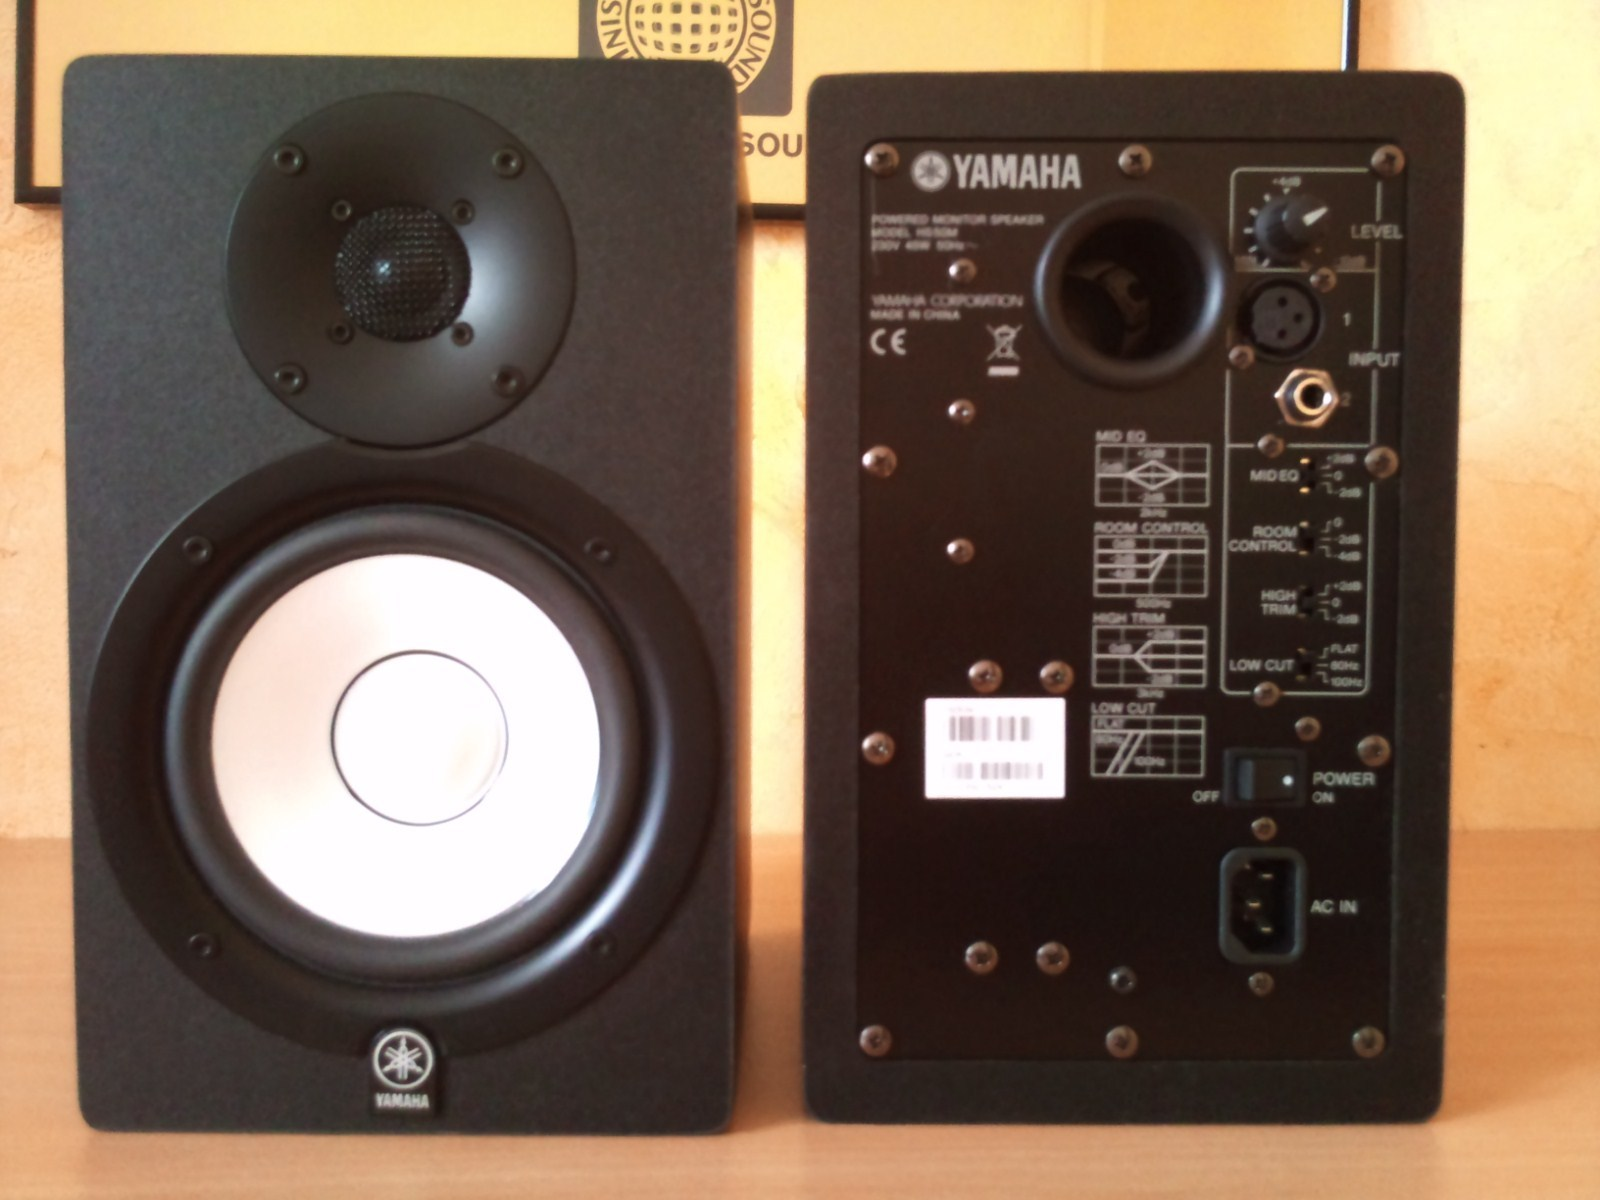 Yamaha hs50m image 96893 audiofanzine for Yamaha hs50m review